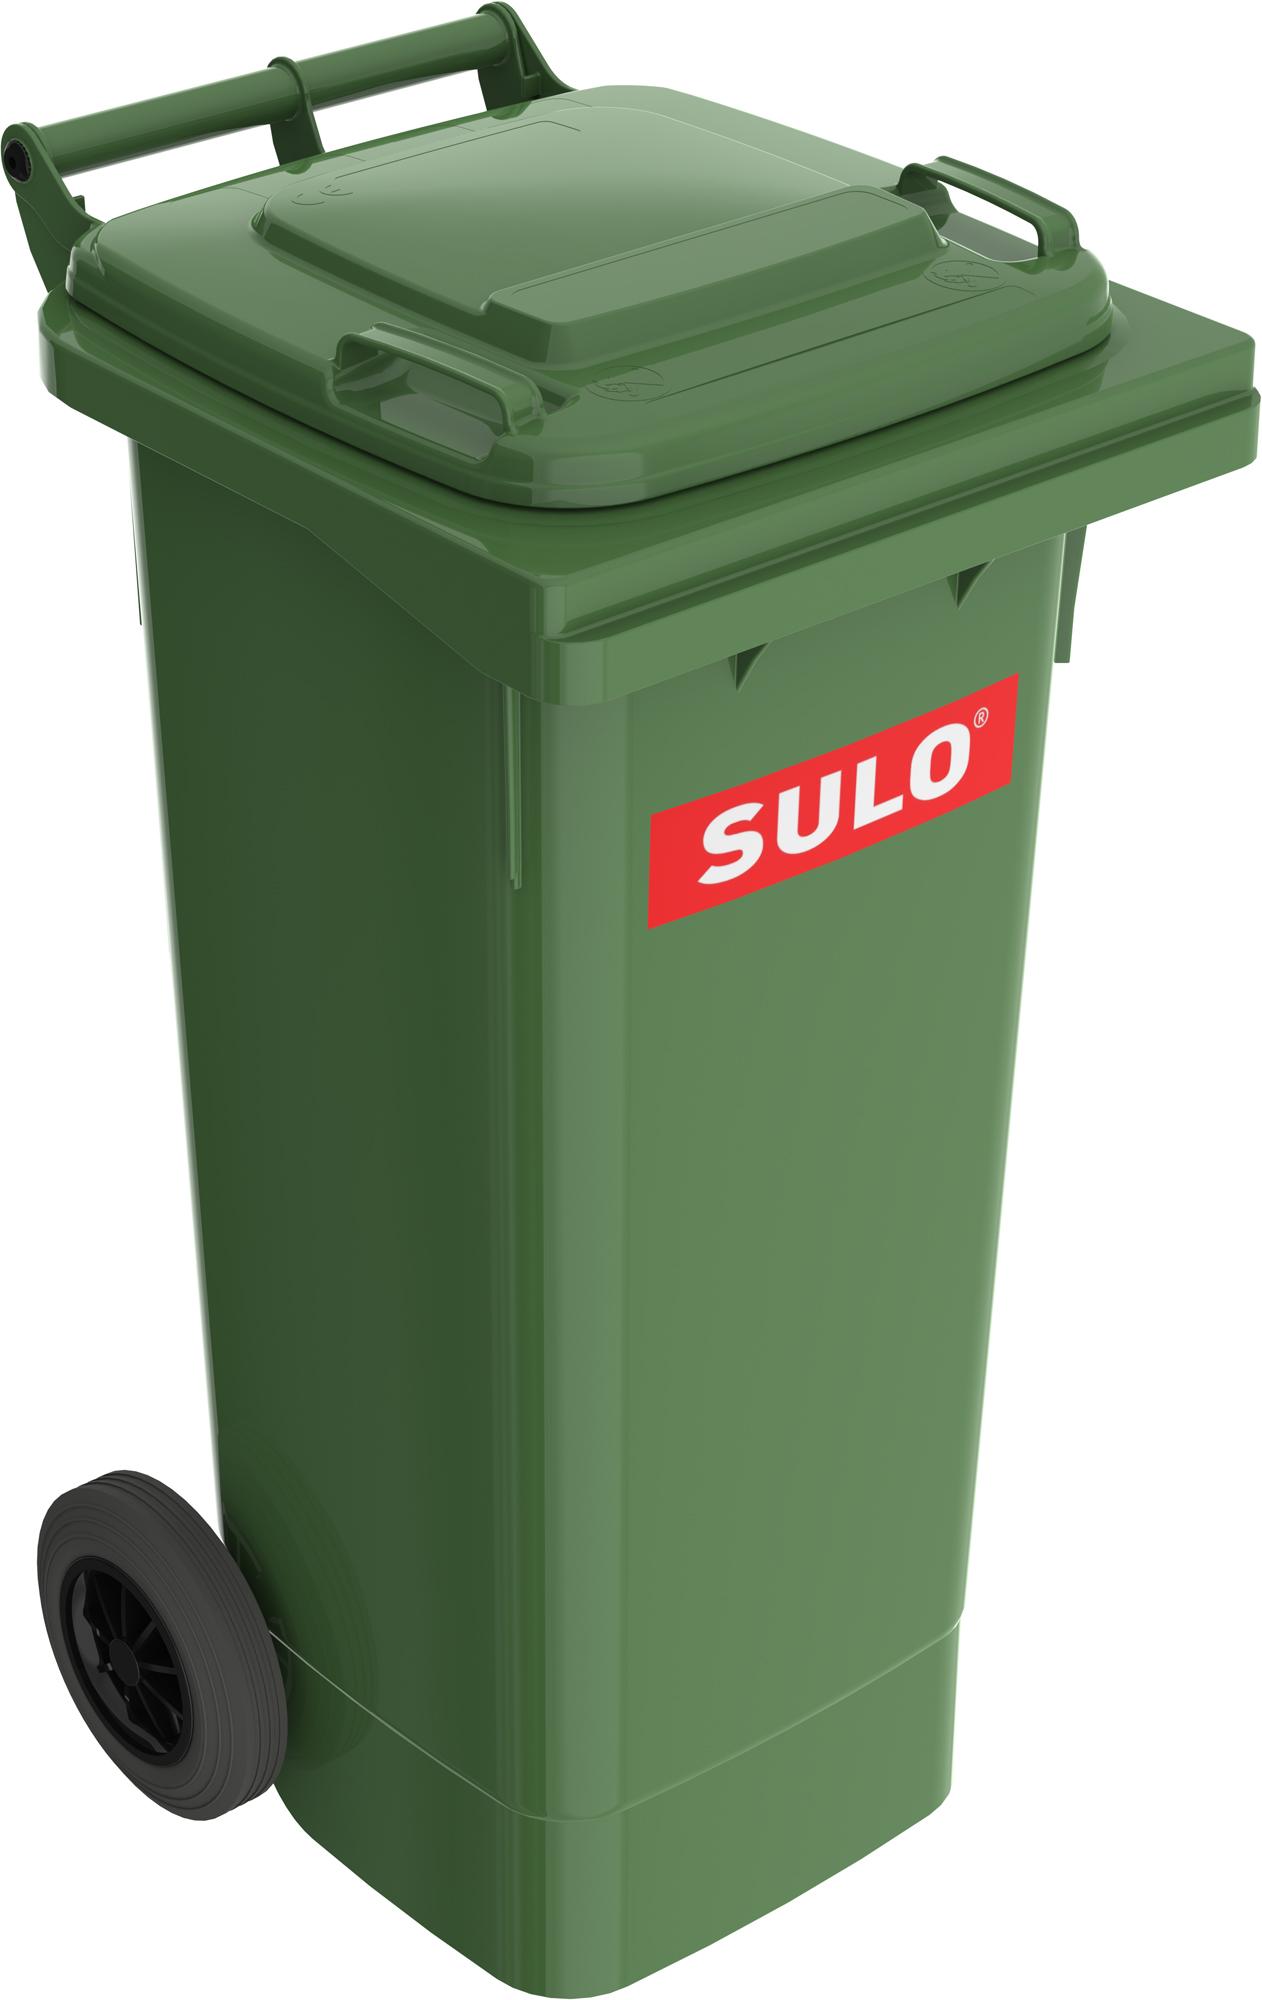 Europubela Din Material Plastic 80l Culoare Verde Mevatec - Transport Inclus 2021 sanito.ro